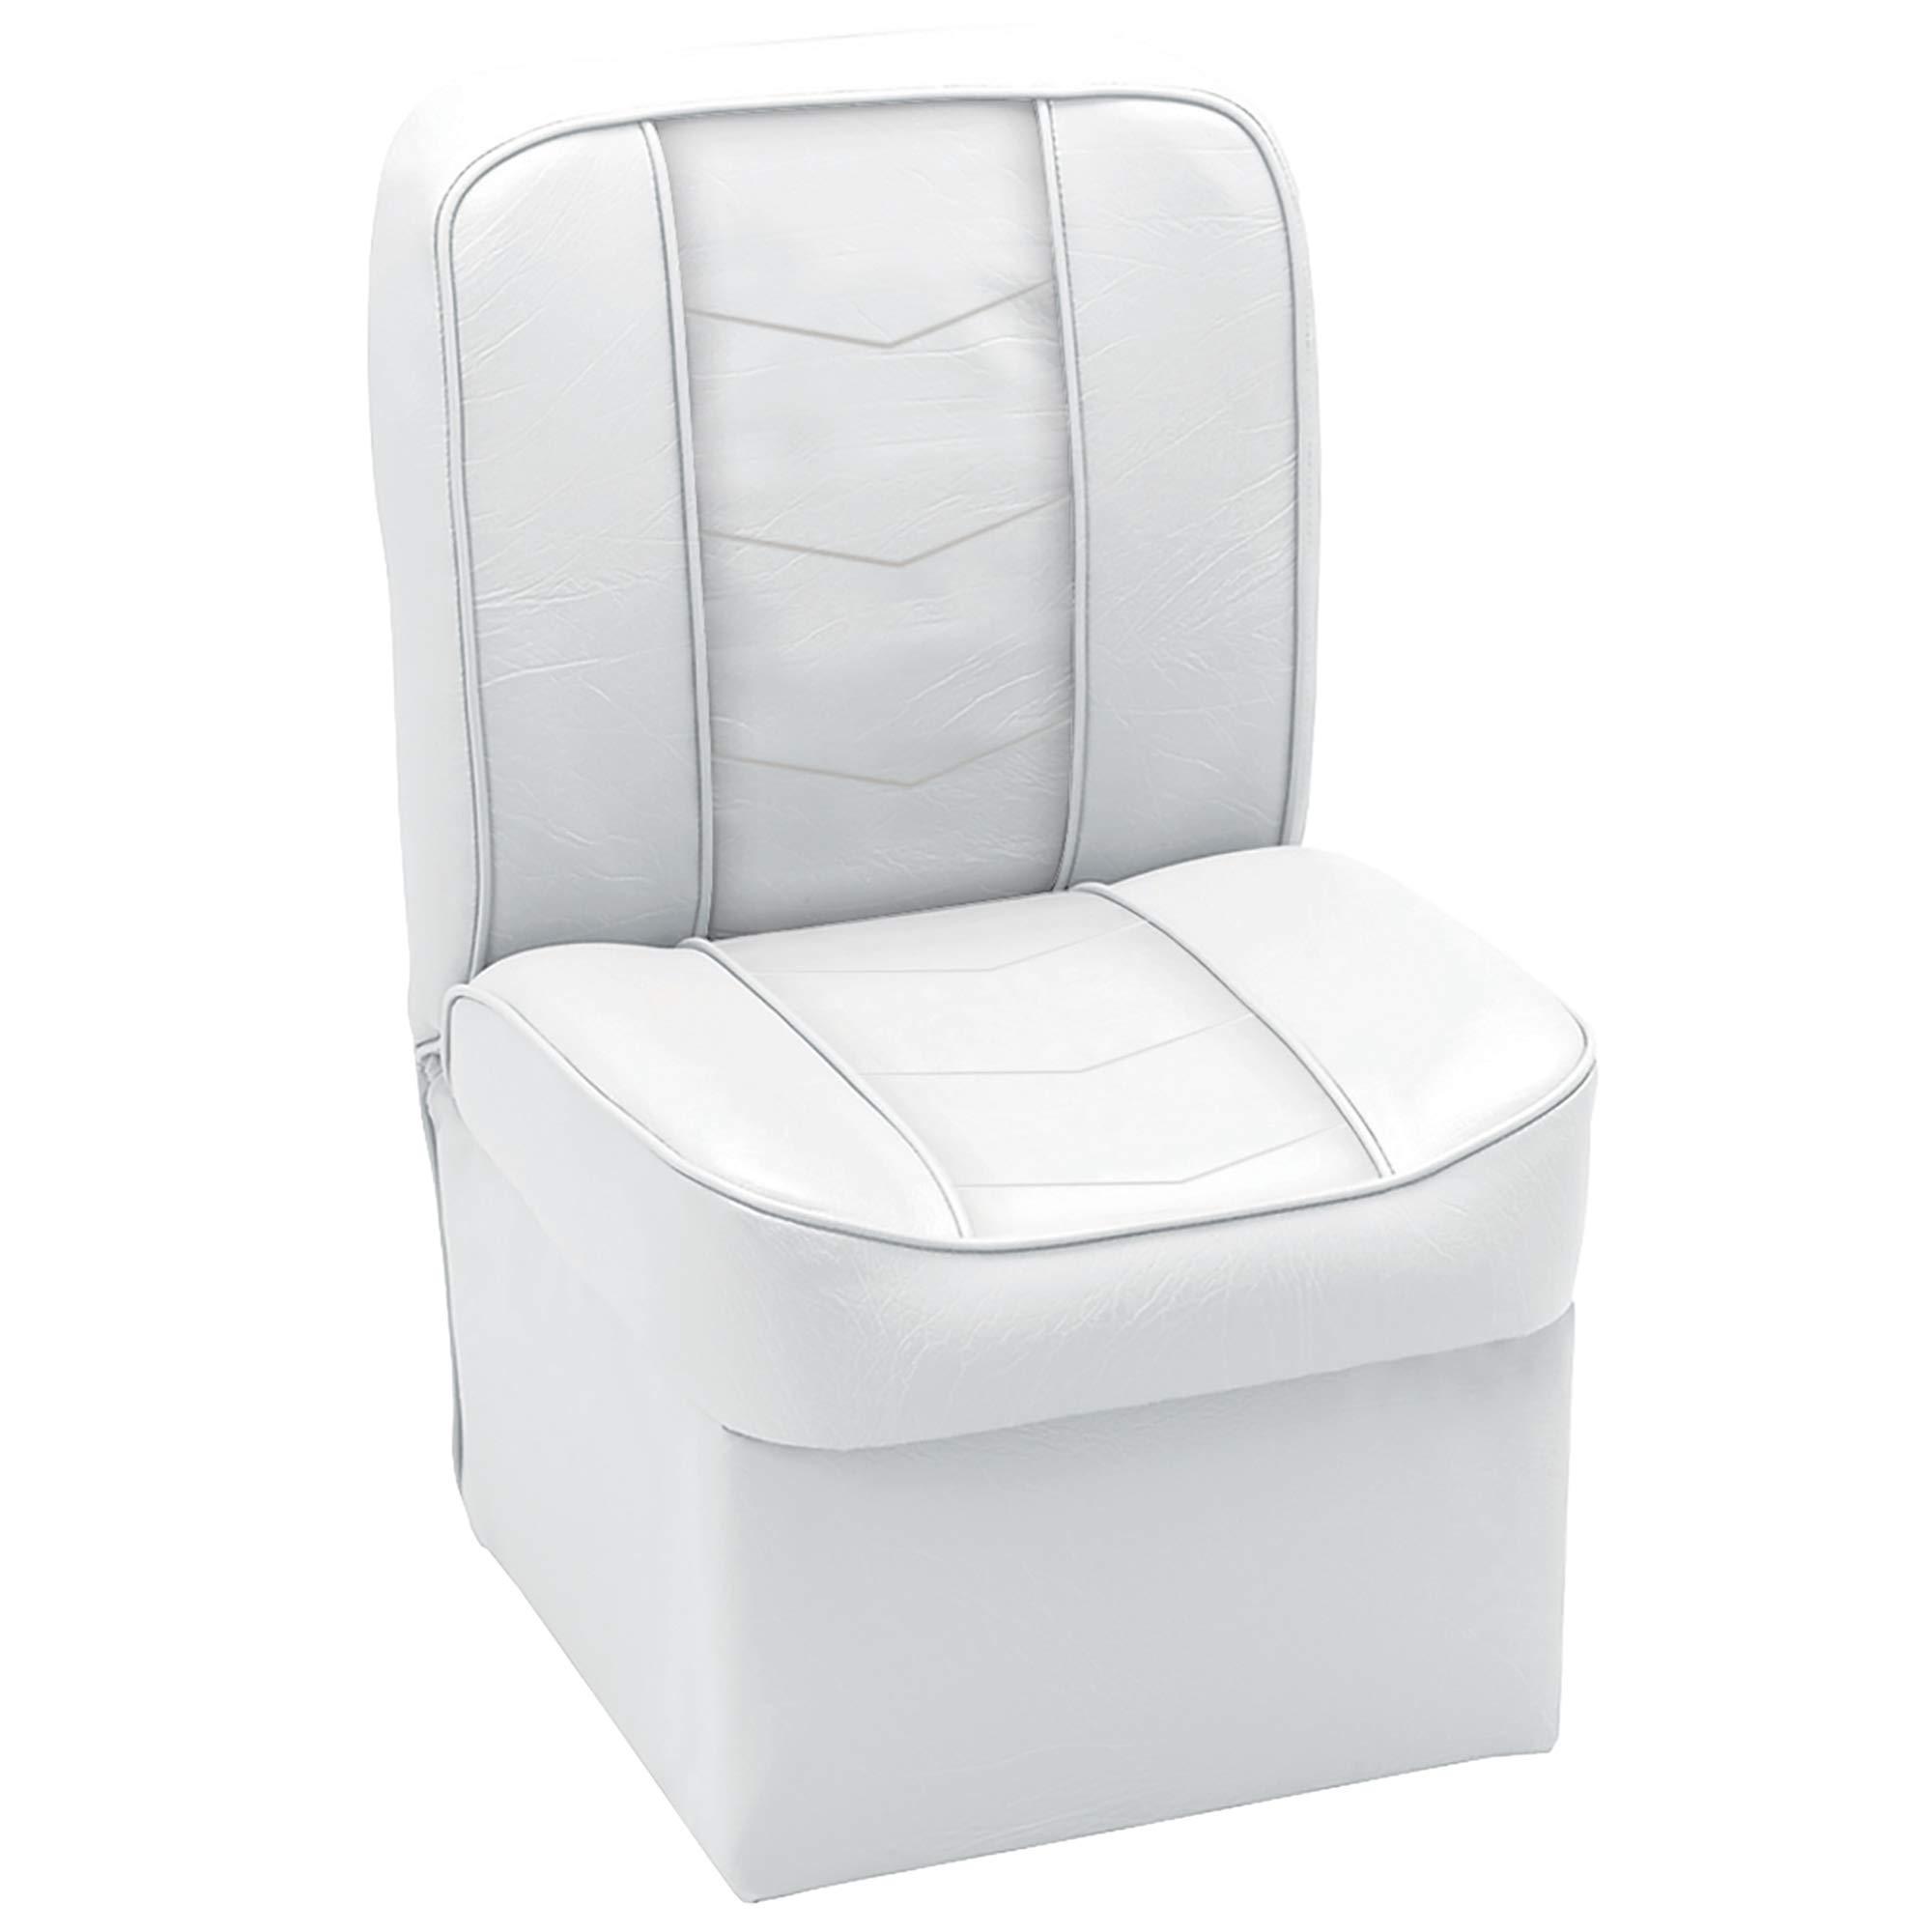 Overton's Standard Jump Seat White by Overton's